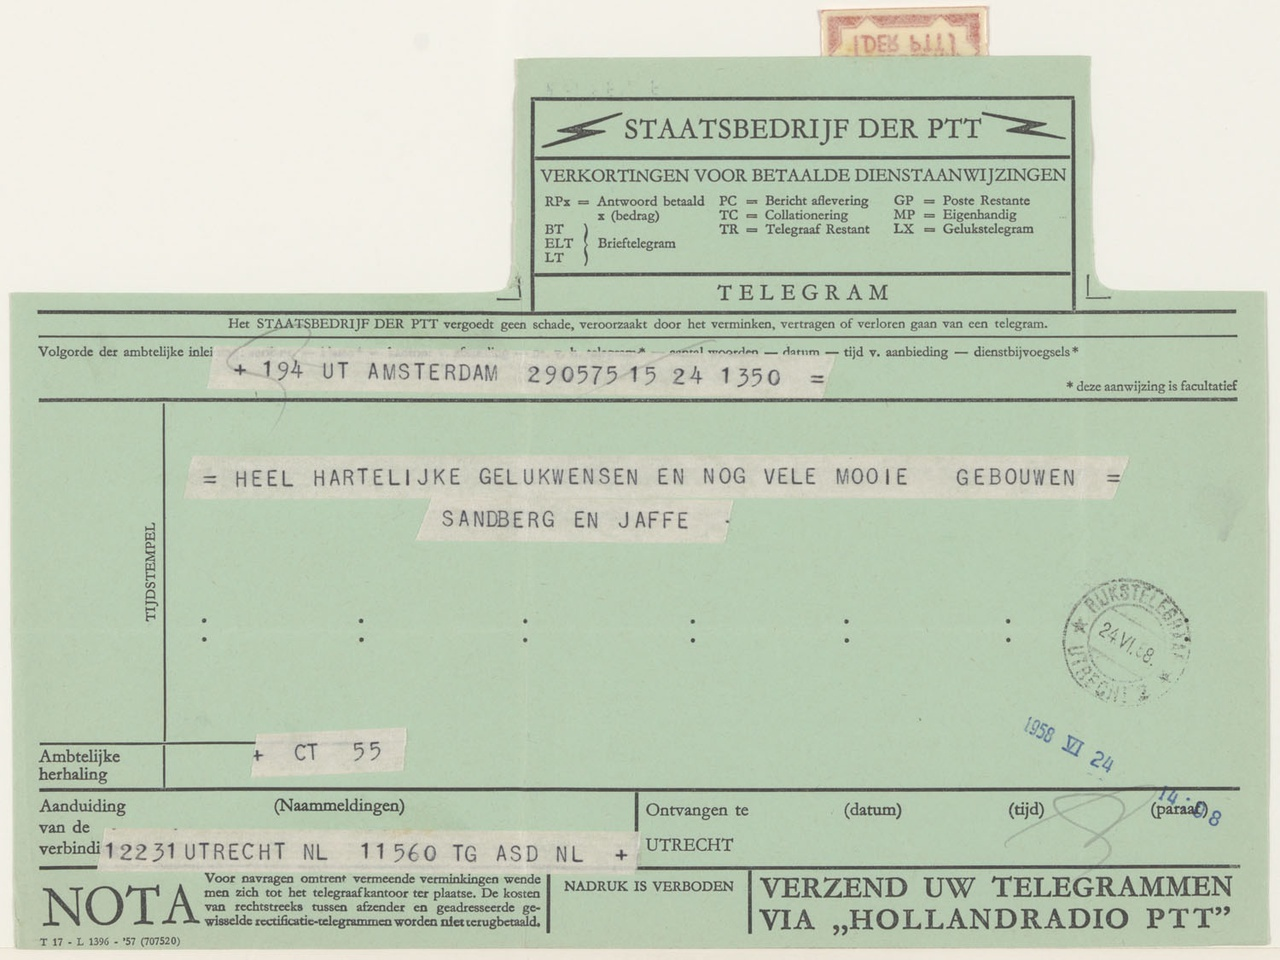 telegram van W. Sandberg / H.L.C. Jaffé aan G. Rietveld